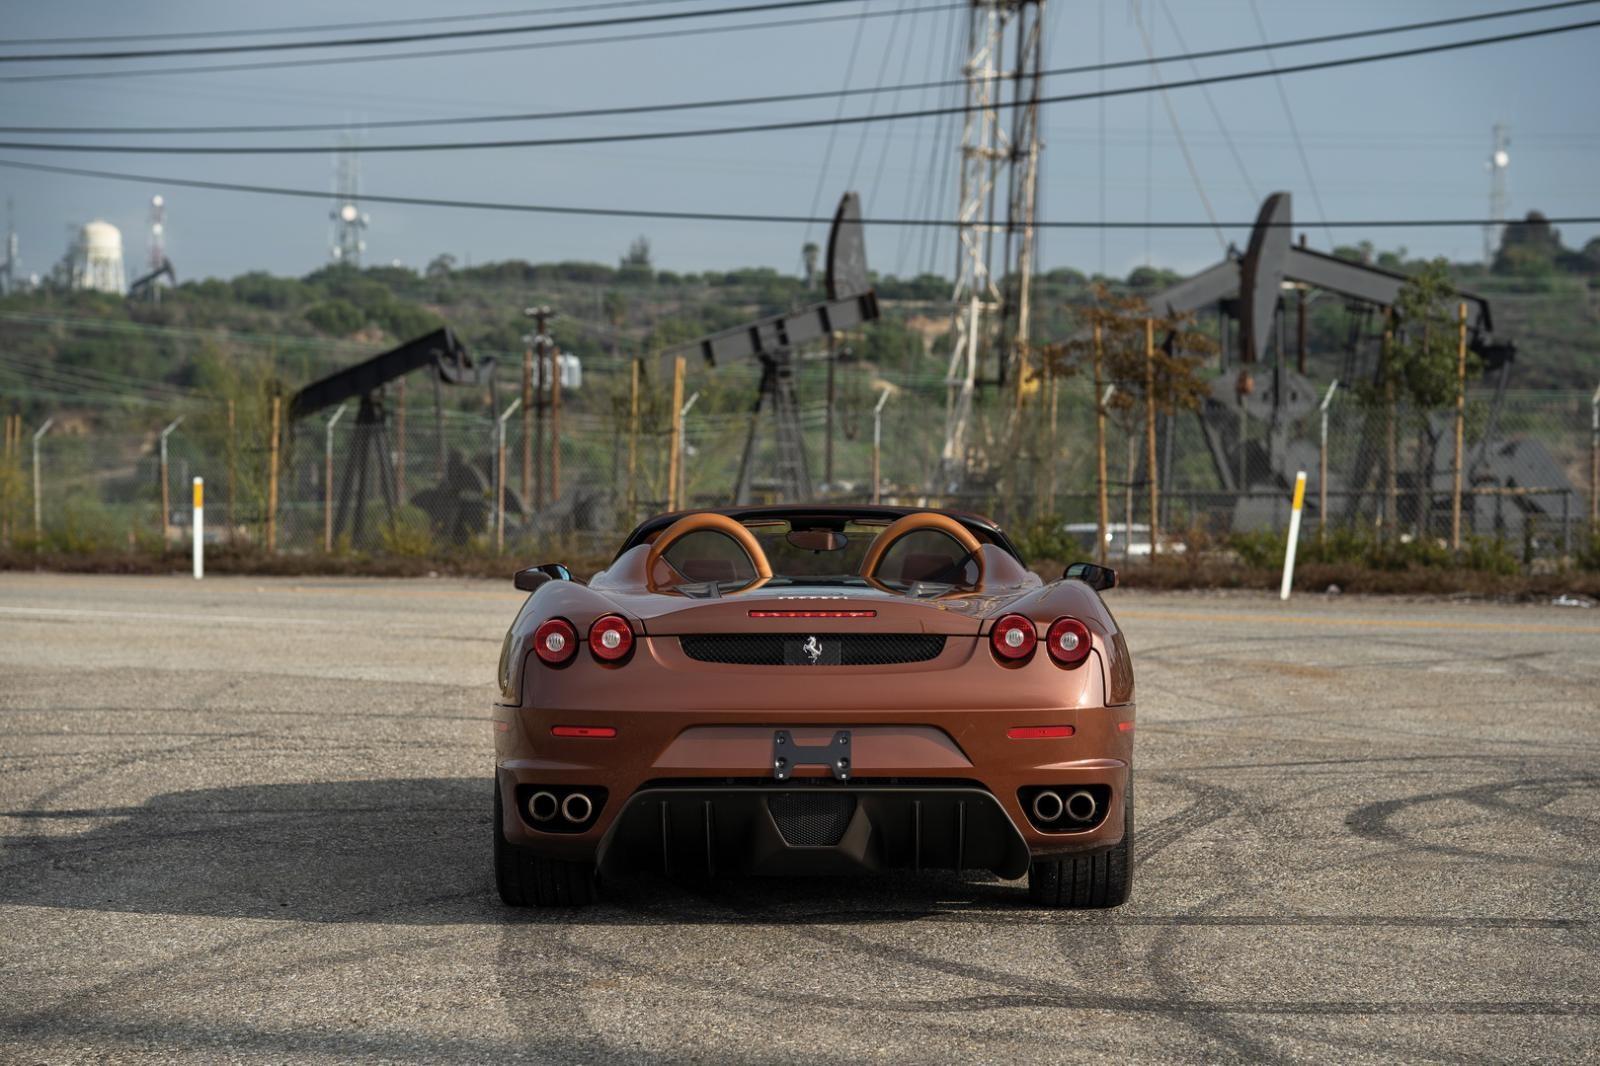 Và khi siêu xe Ferrari F430 Spider này mở mui